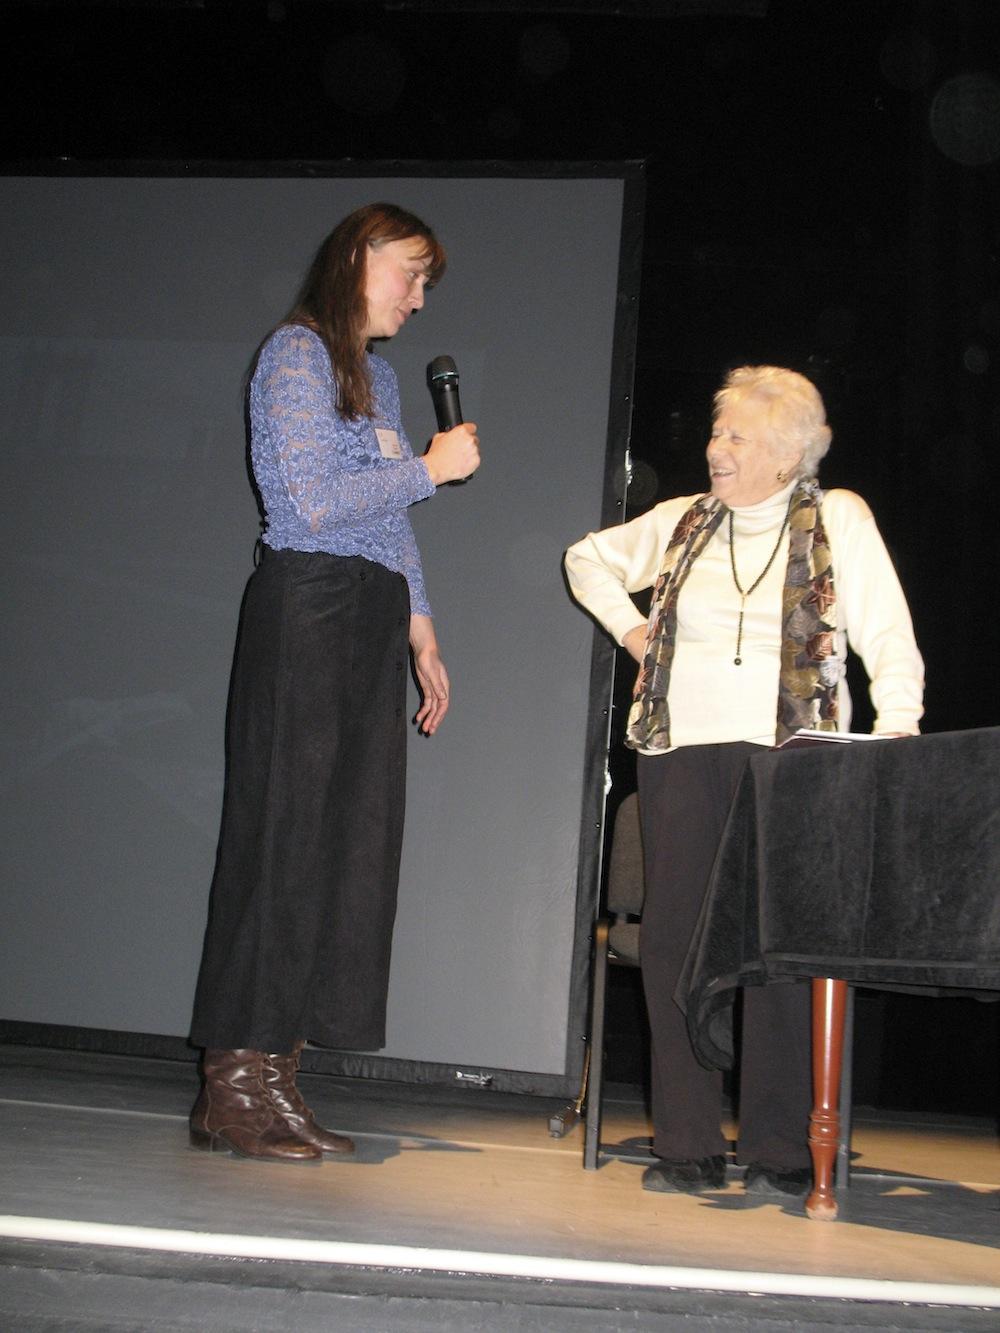 Naomi Rosenblum being interviewed by Inez Baturo at Foto Art Festival, Poland